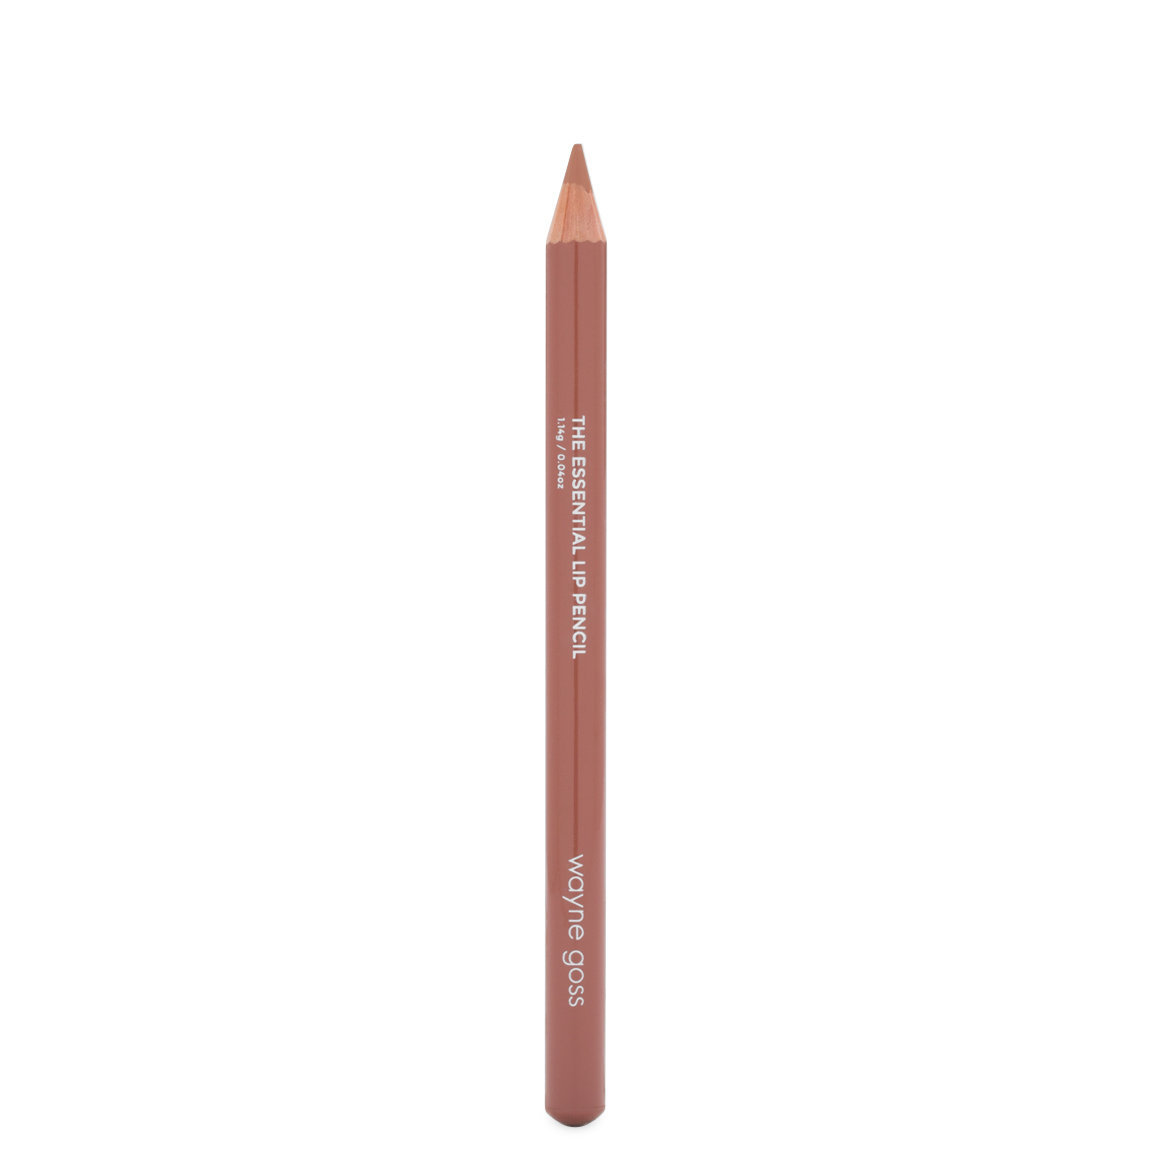 Wayne Goss The Essential Lip Pencil Medium Nude alternative view 1.